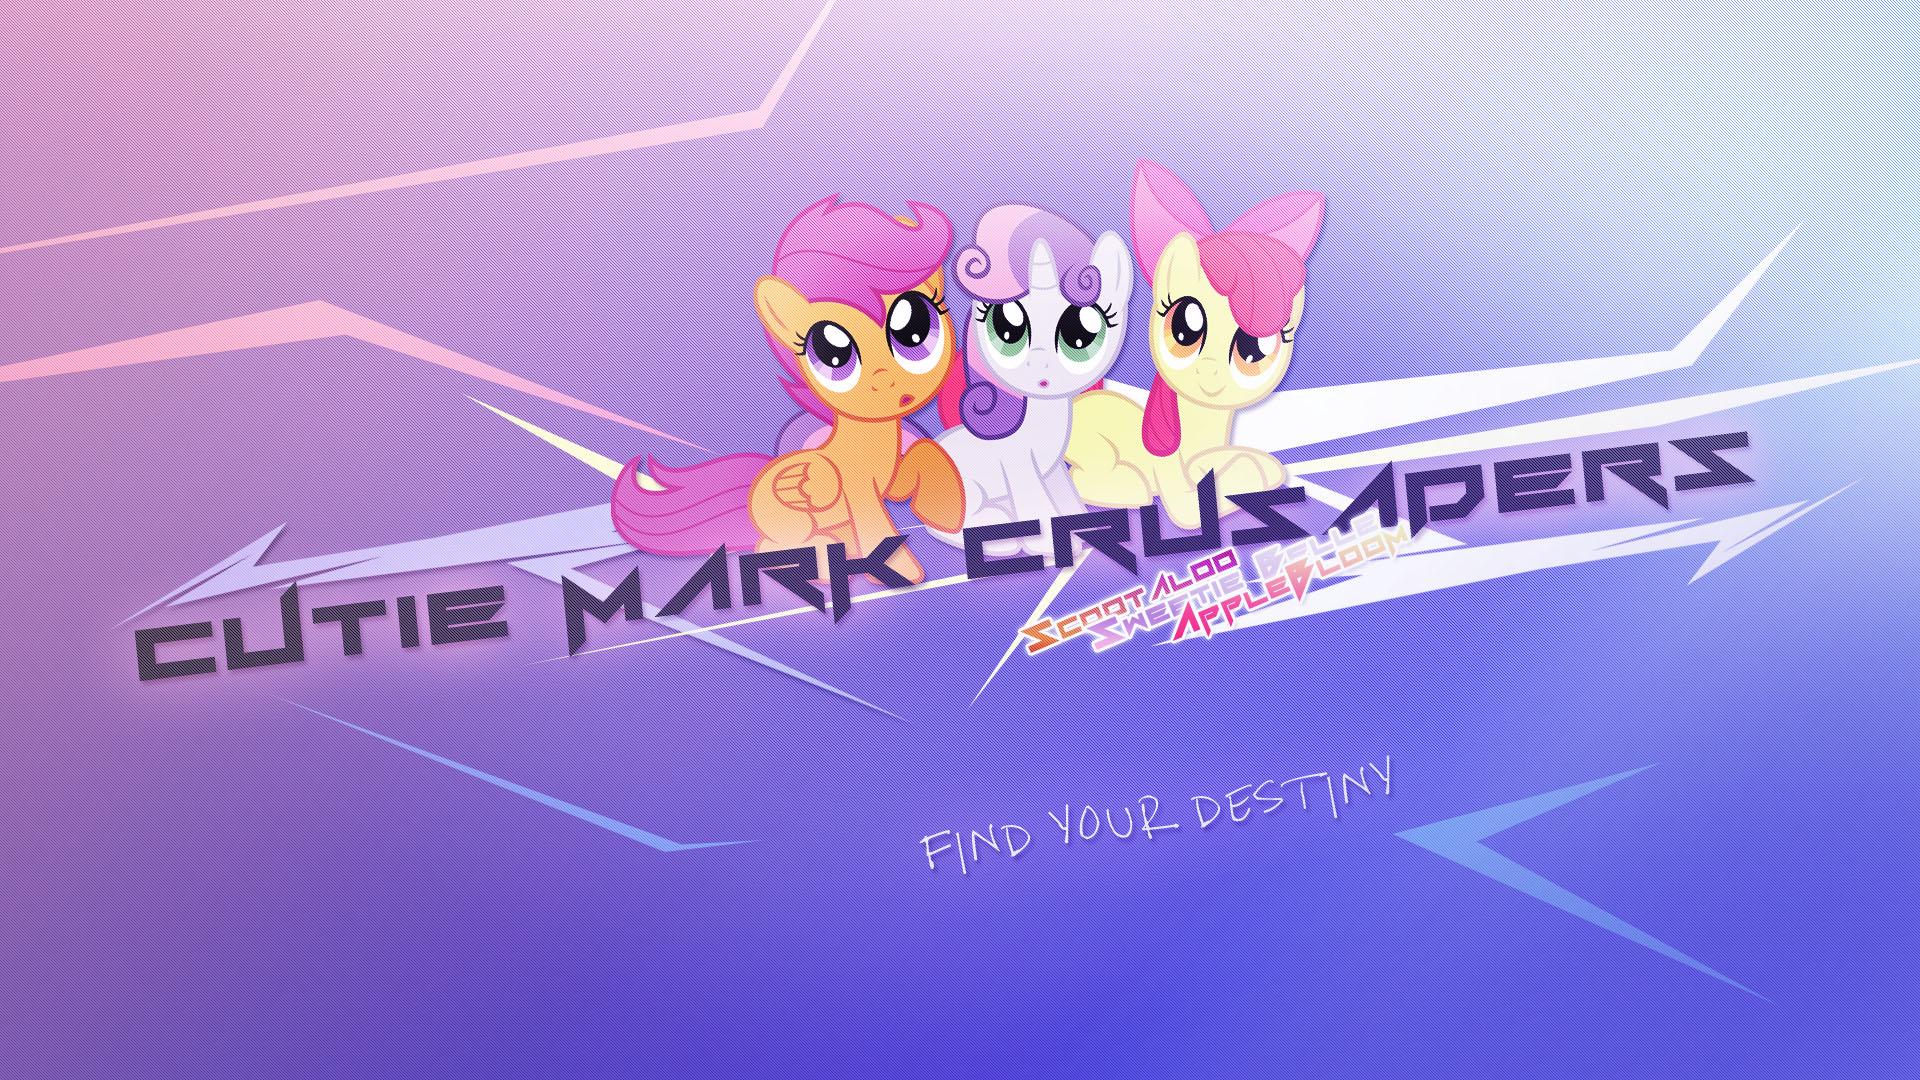 CmC: Find Your Destiny by ShadowDashie and Xtrl